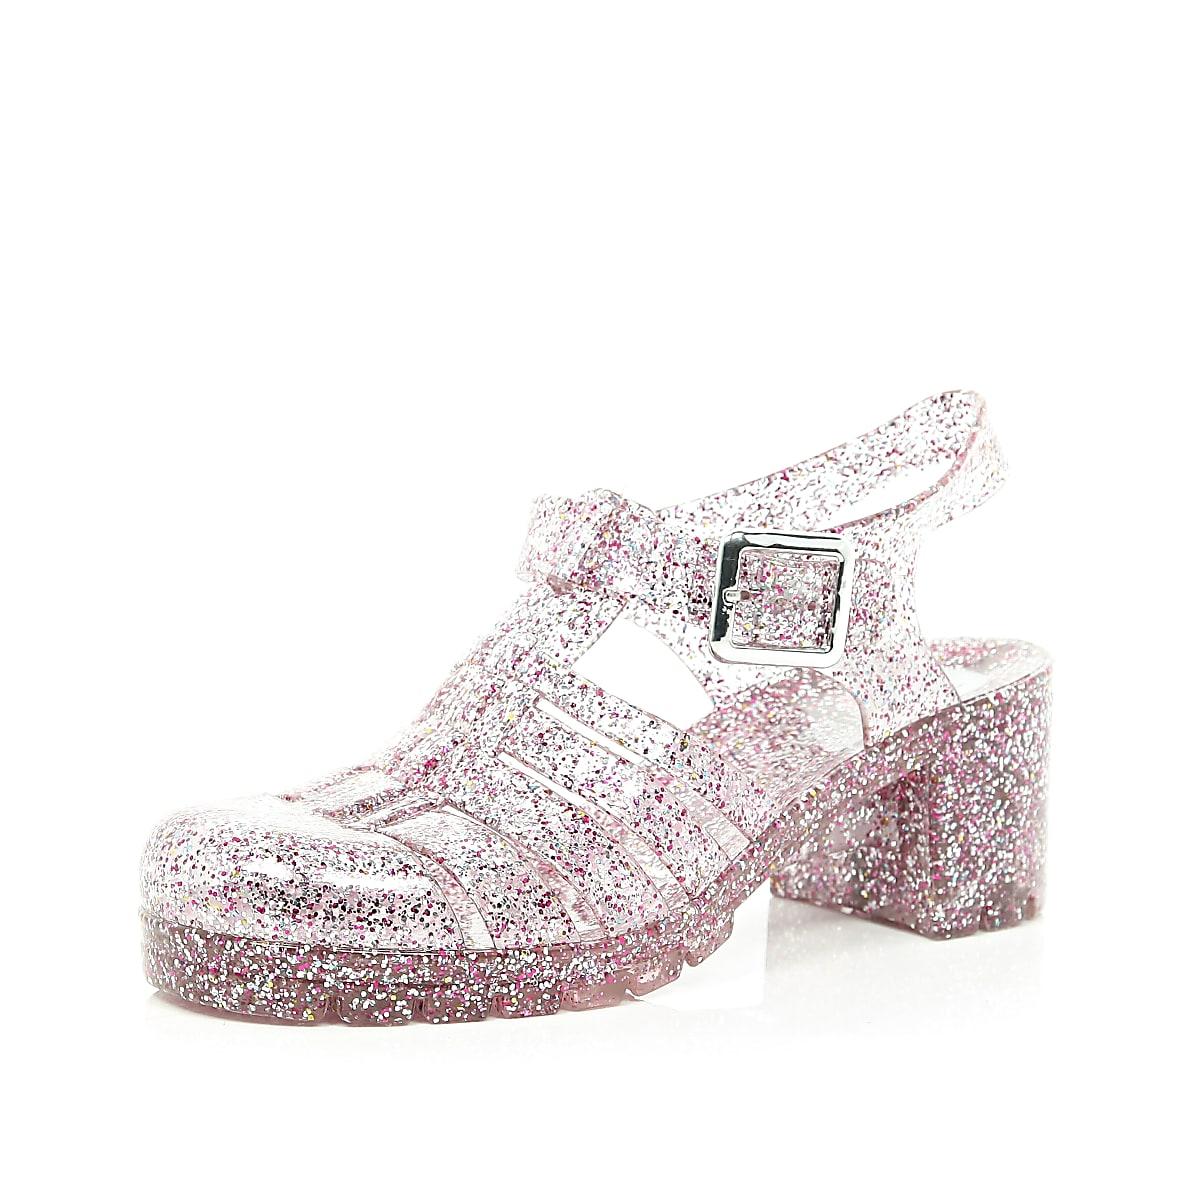 6426704e12a1 Pink glitter block heel jelly shoes - Sandals - Shoes   Boots - women